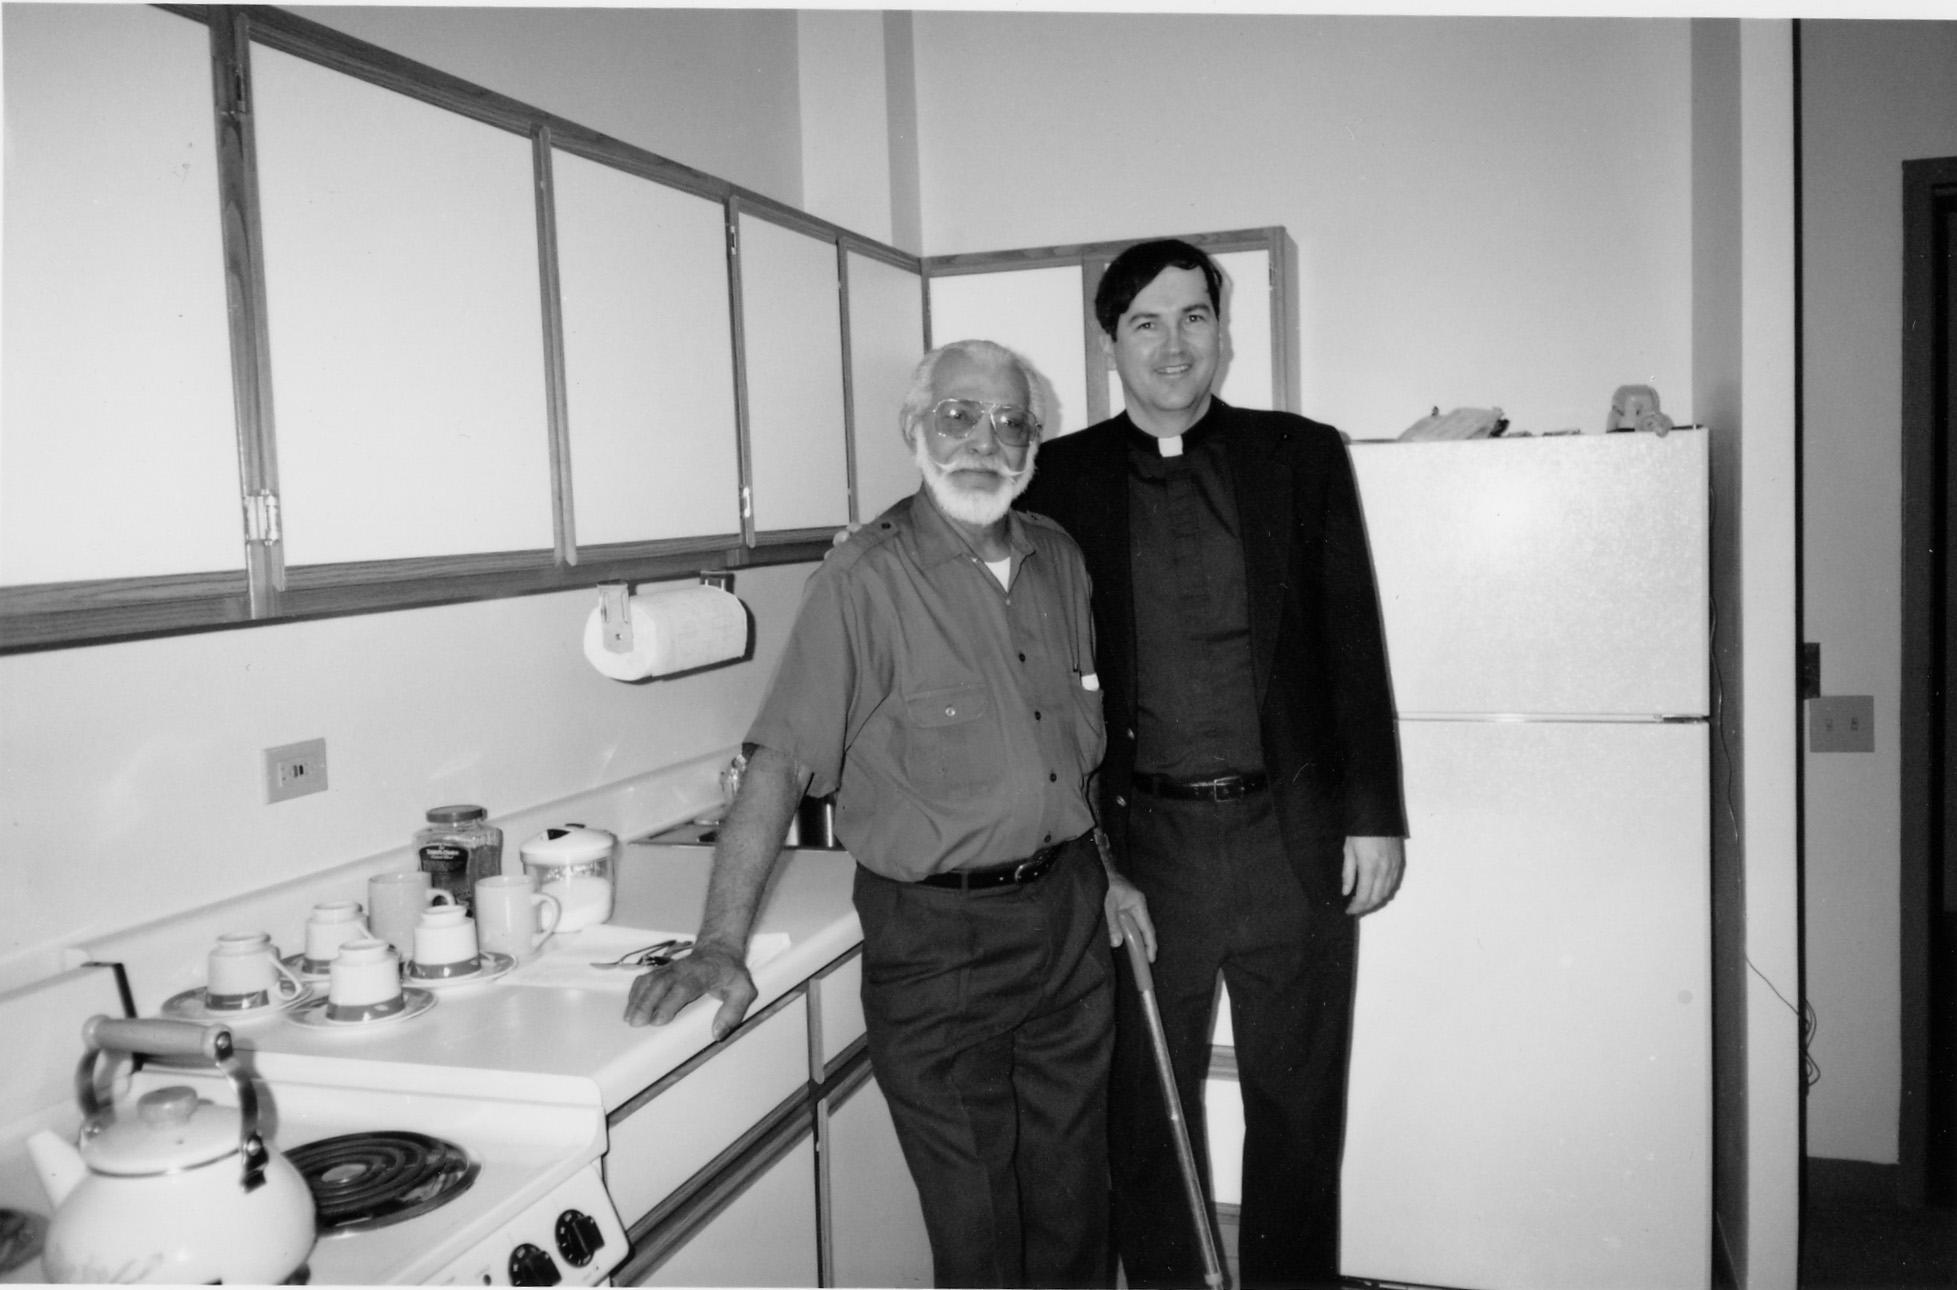 6-J   priest and senior in kitchen 70s.jpg